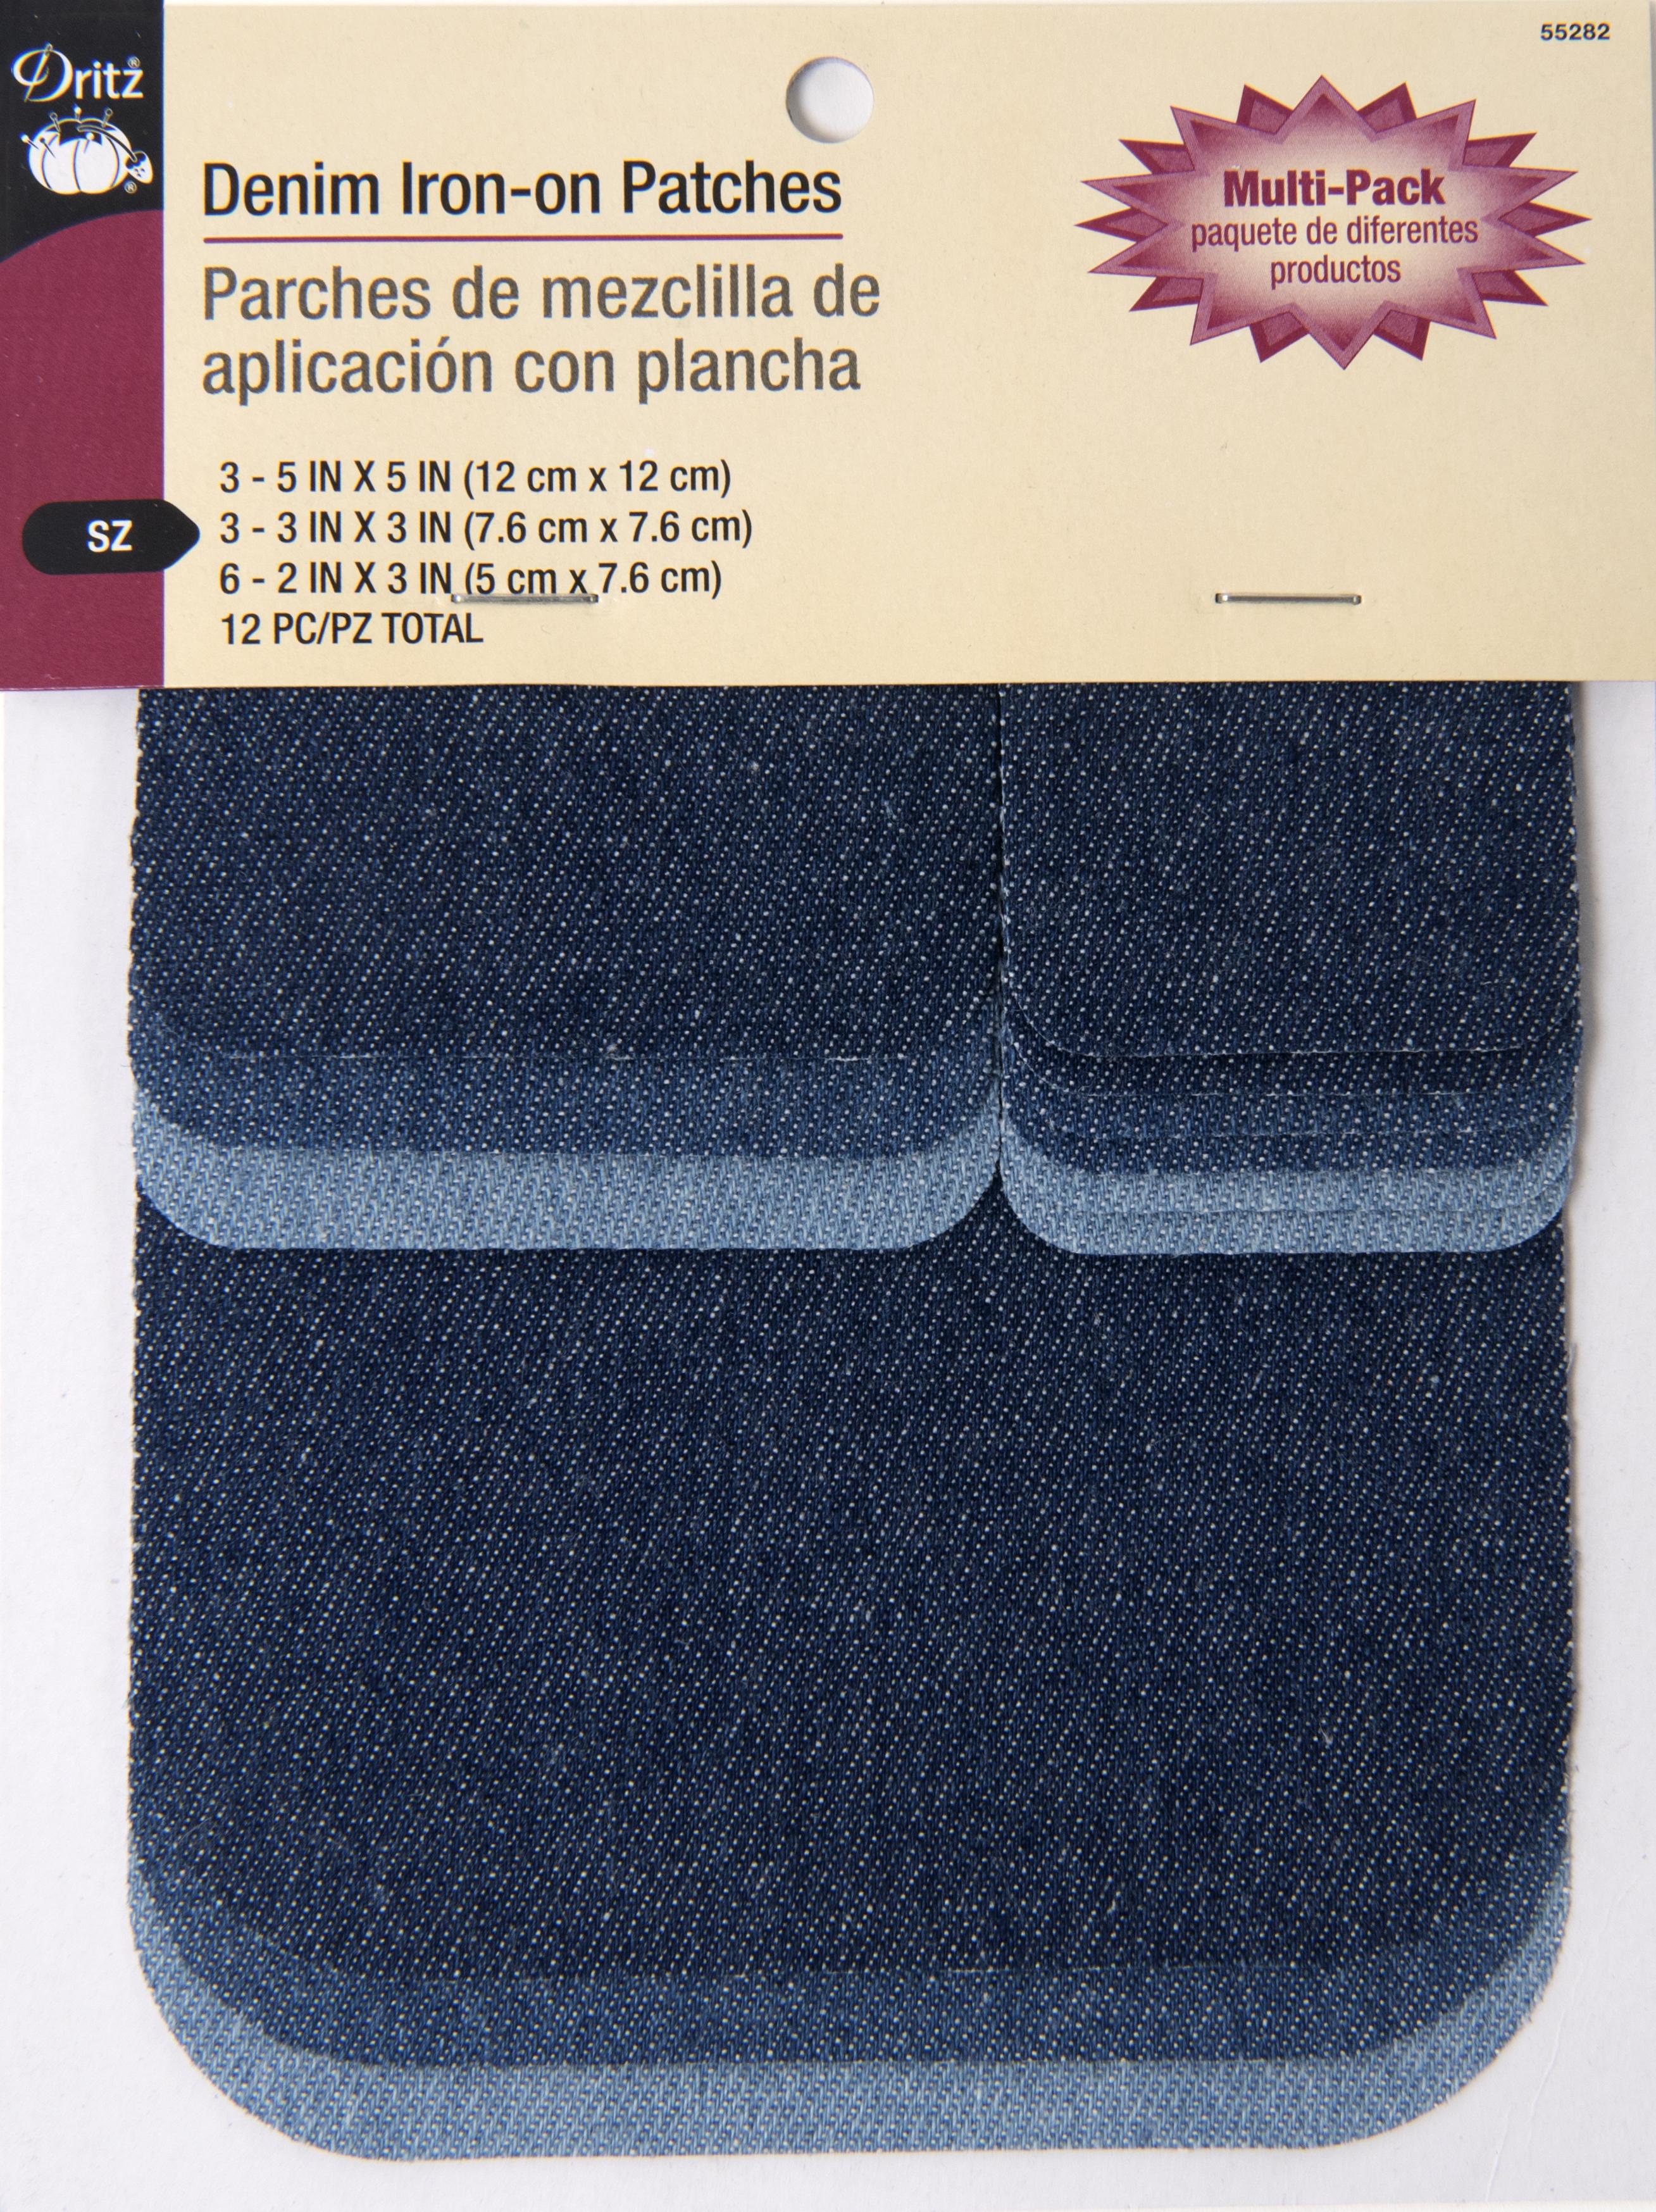 Denim Iron-On Patches-55282